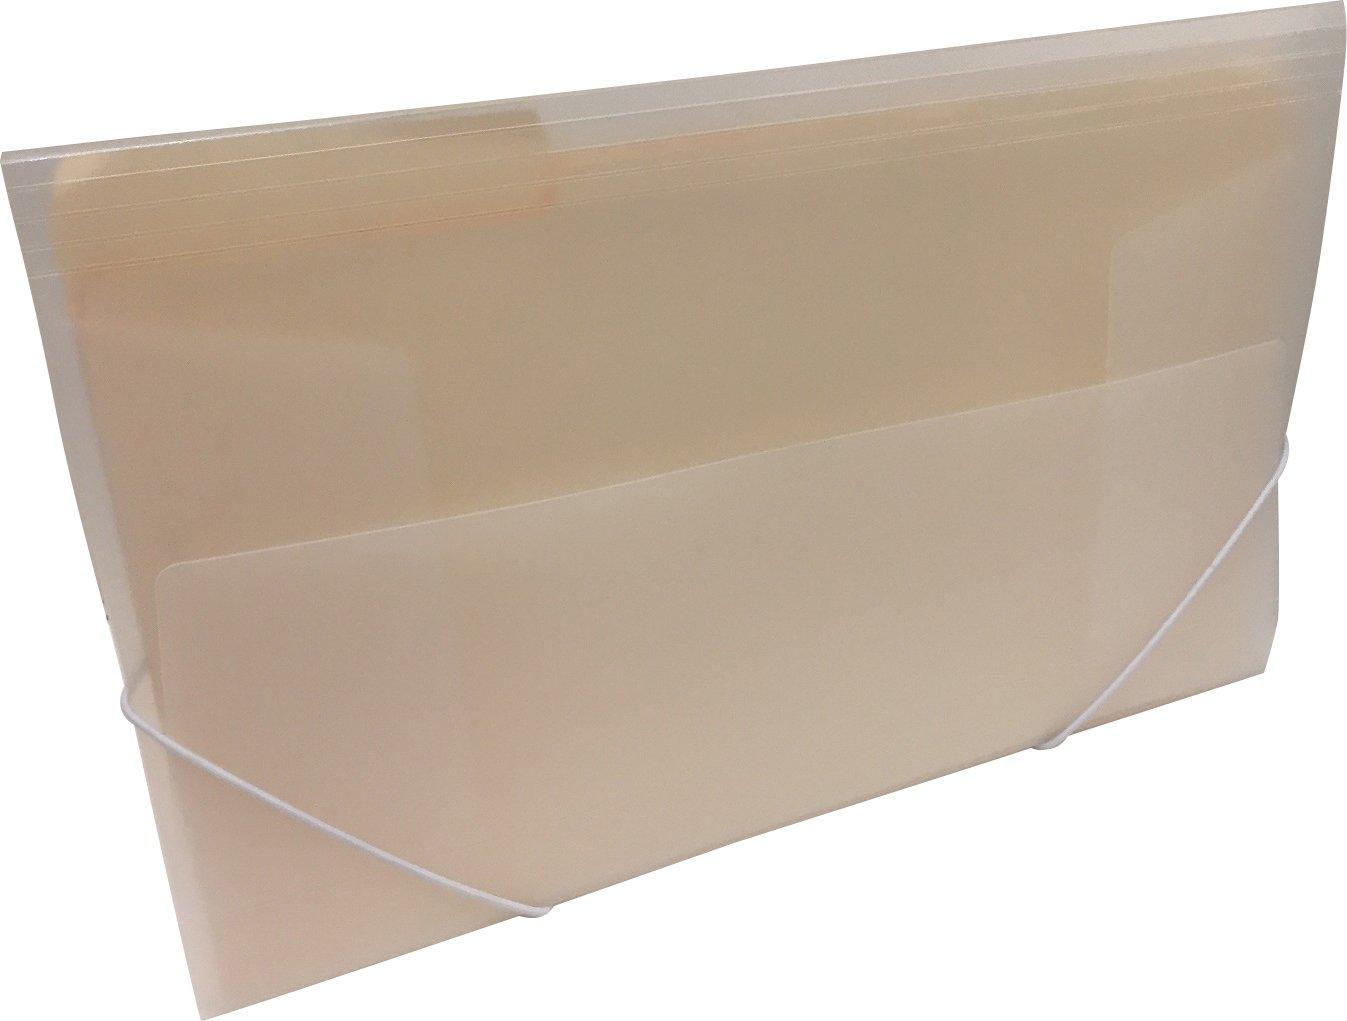 Legal Size File Folder Case with Elastic Strap Closure (2pcs) 11'' x 15'' x 1.25 Clear